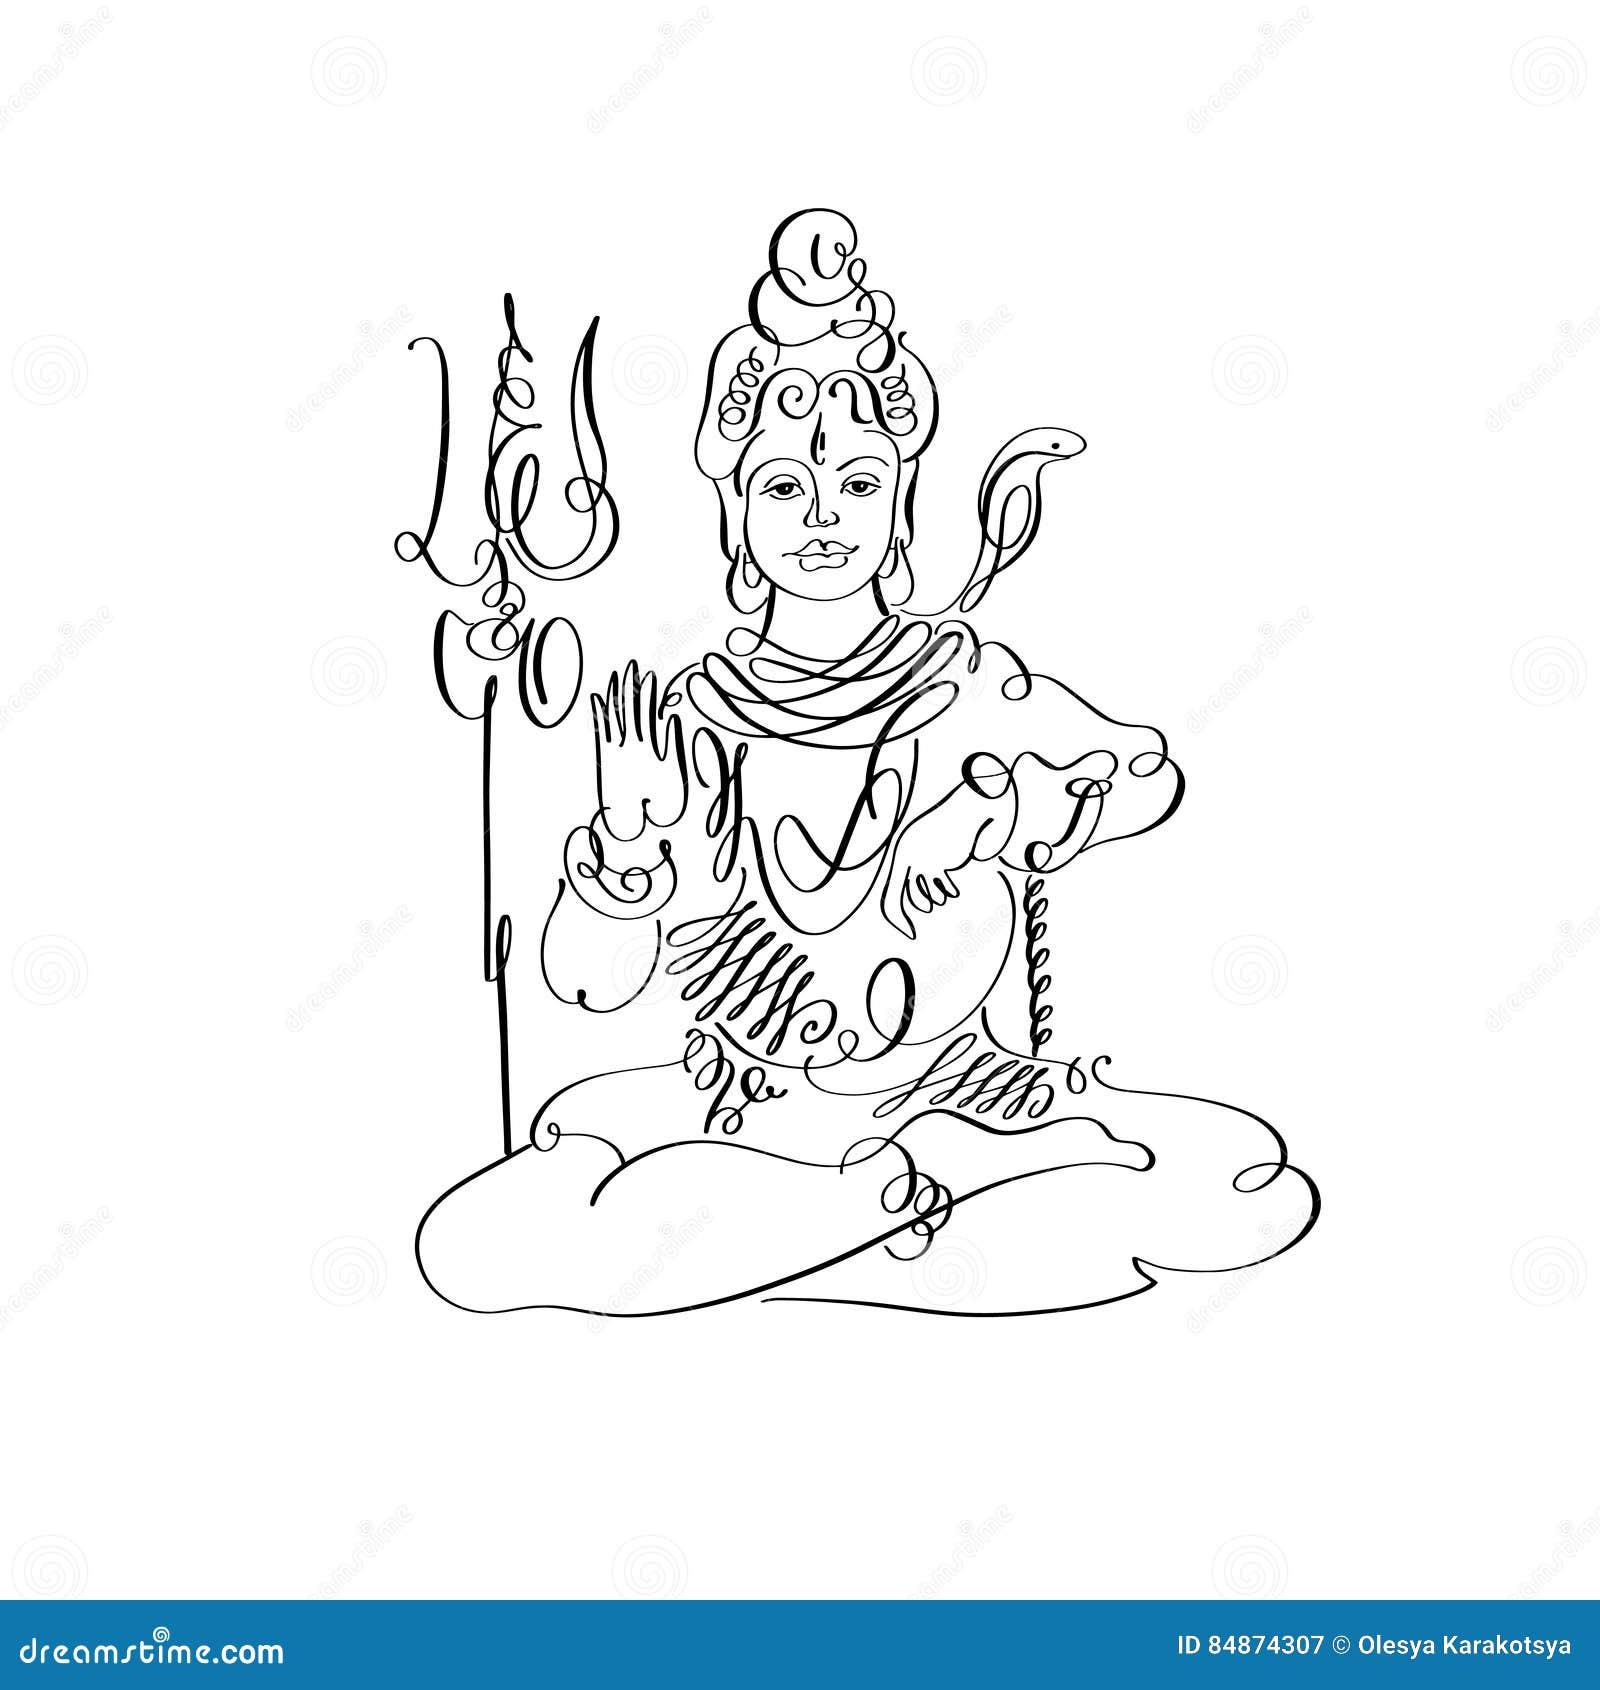 Dessin Calligraphique Noir Et Blanc De Lord Shiva A Maha